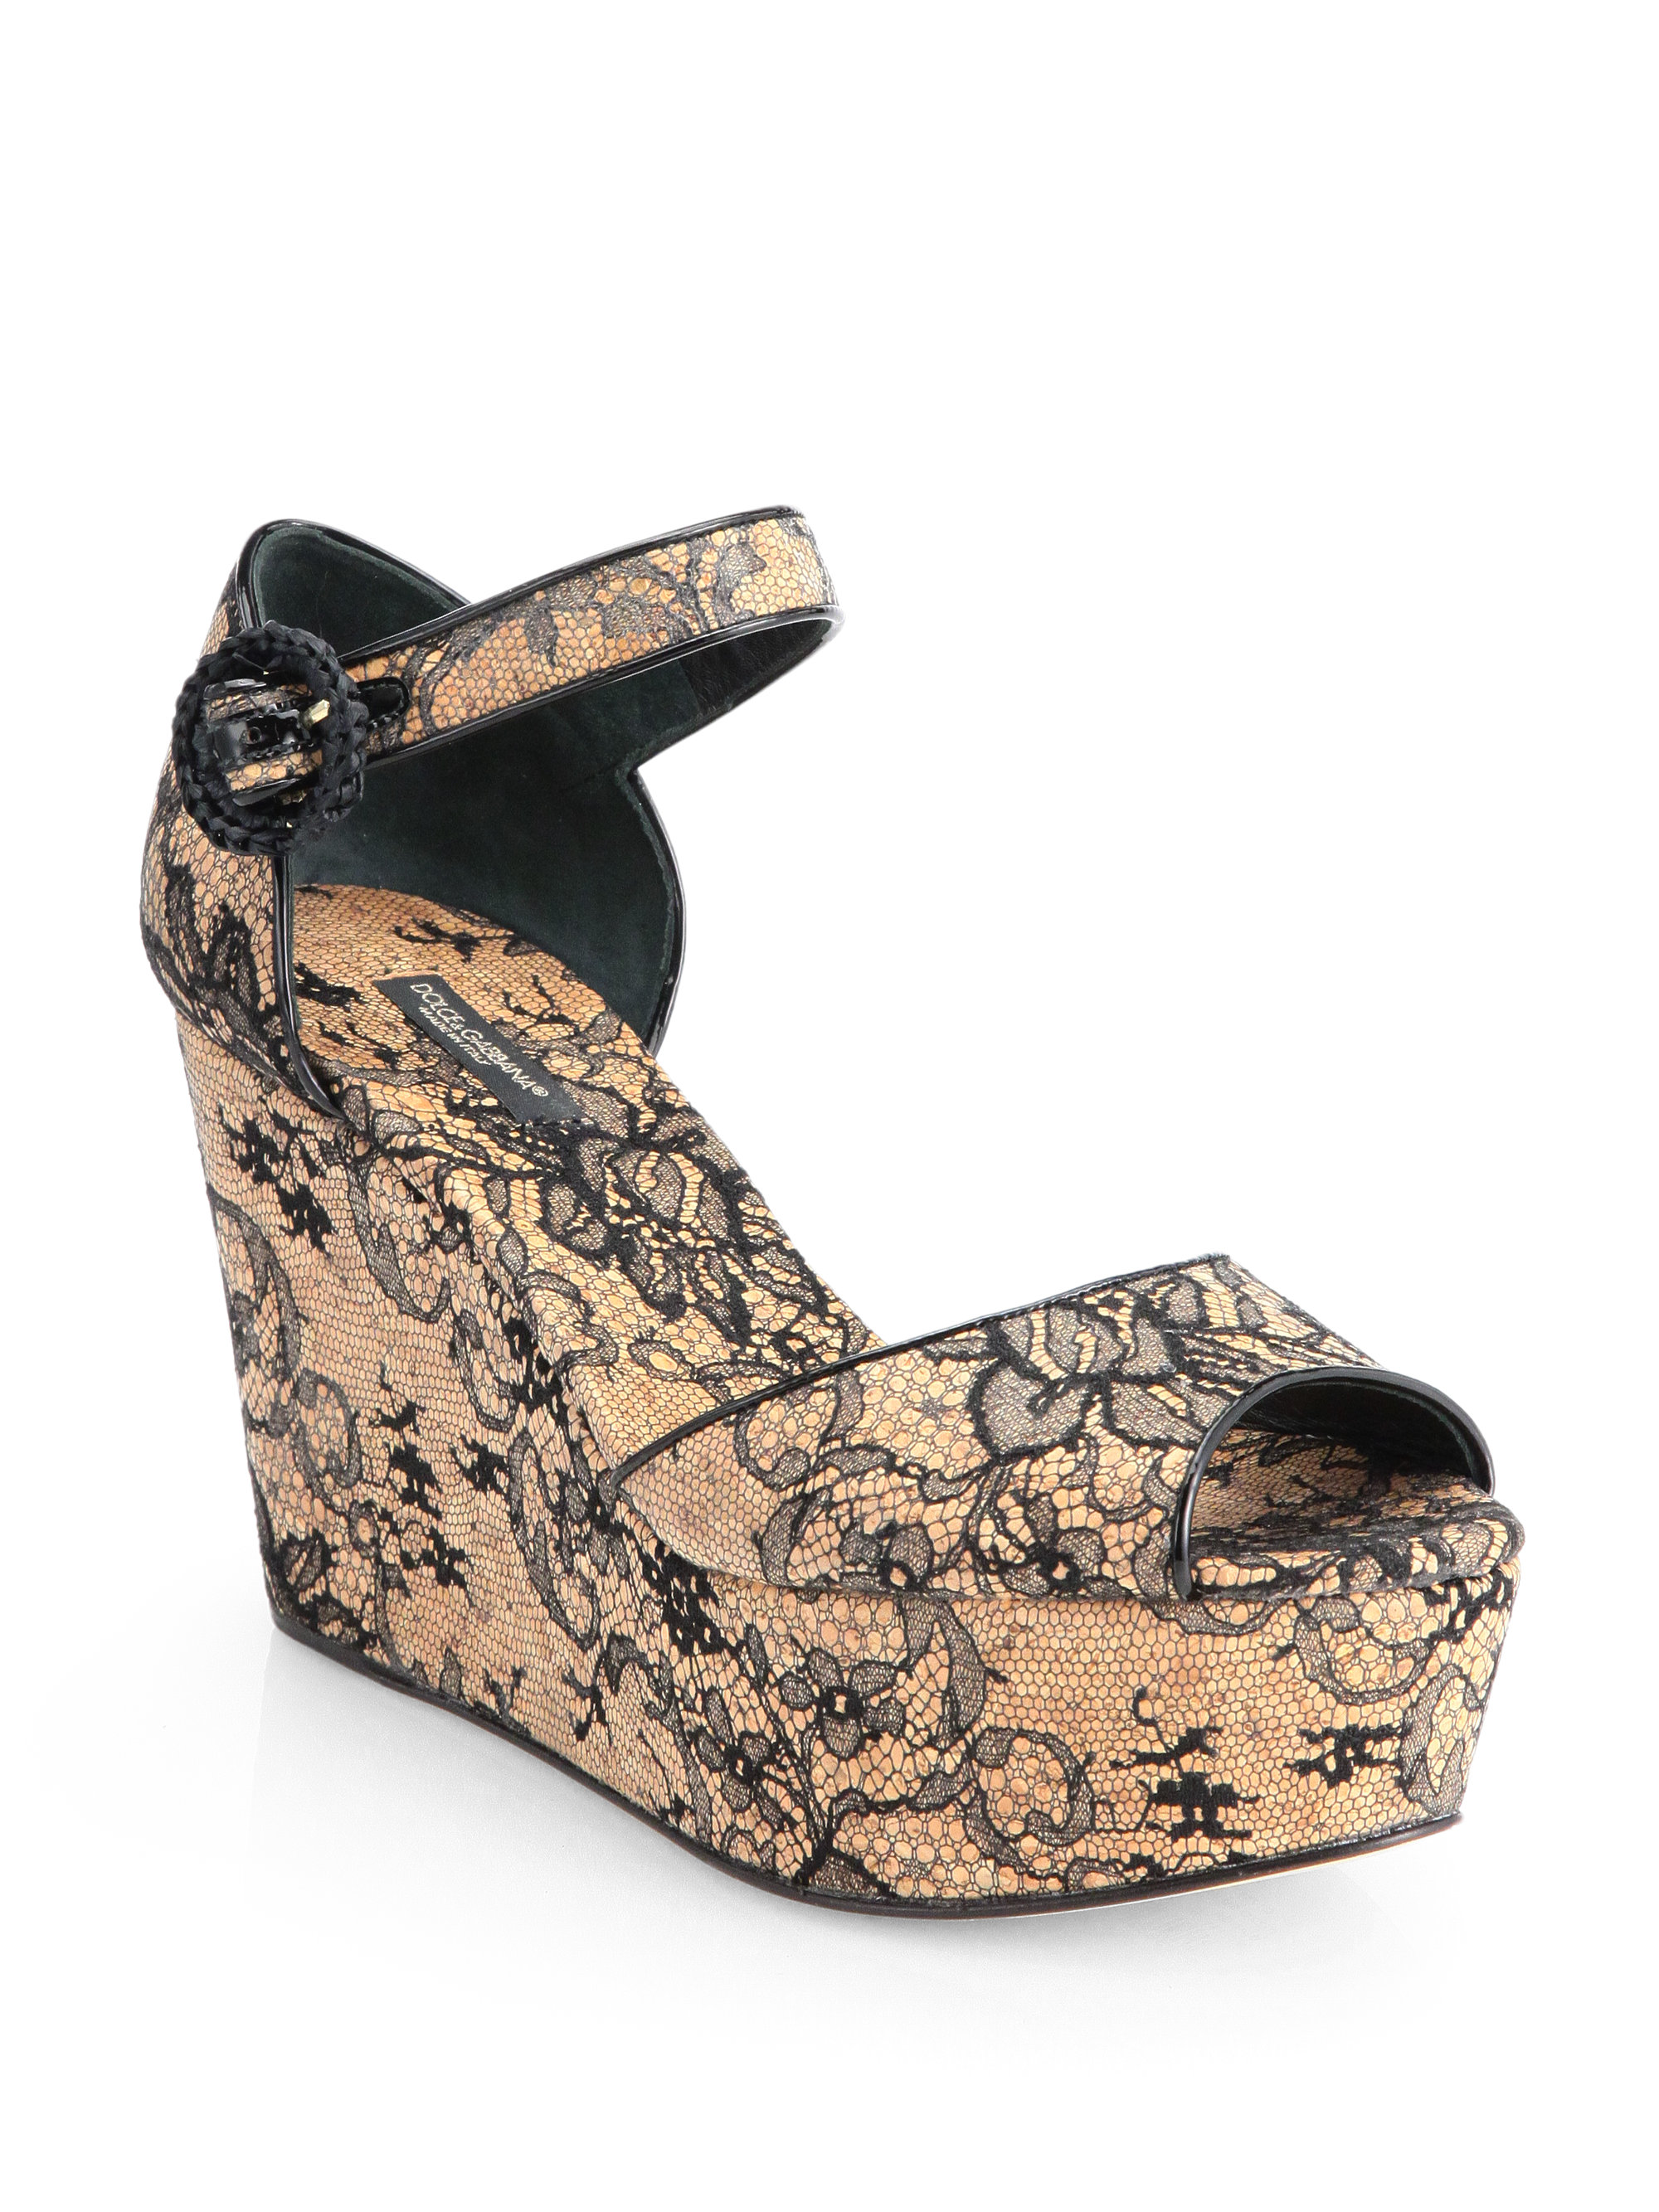 Dolce Amp Gabbana Cork Lace Wedge Sandals In Beige Black